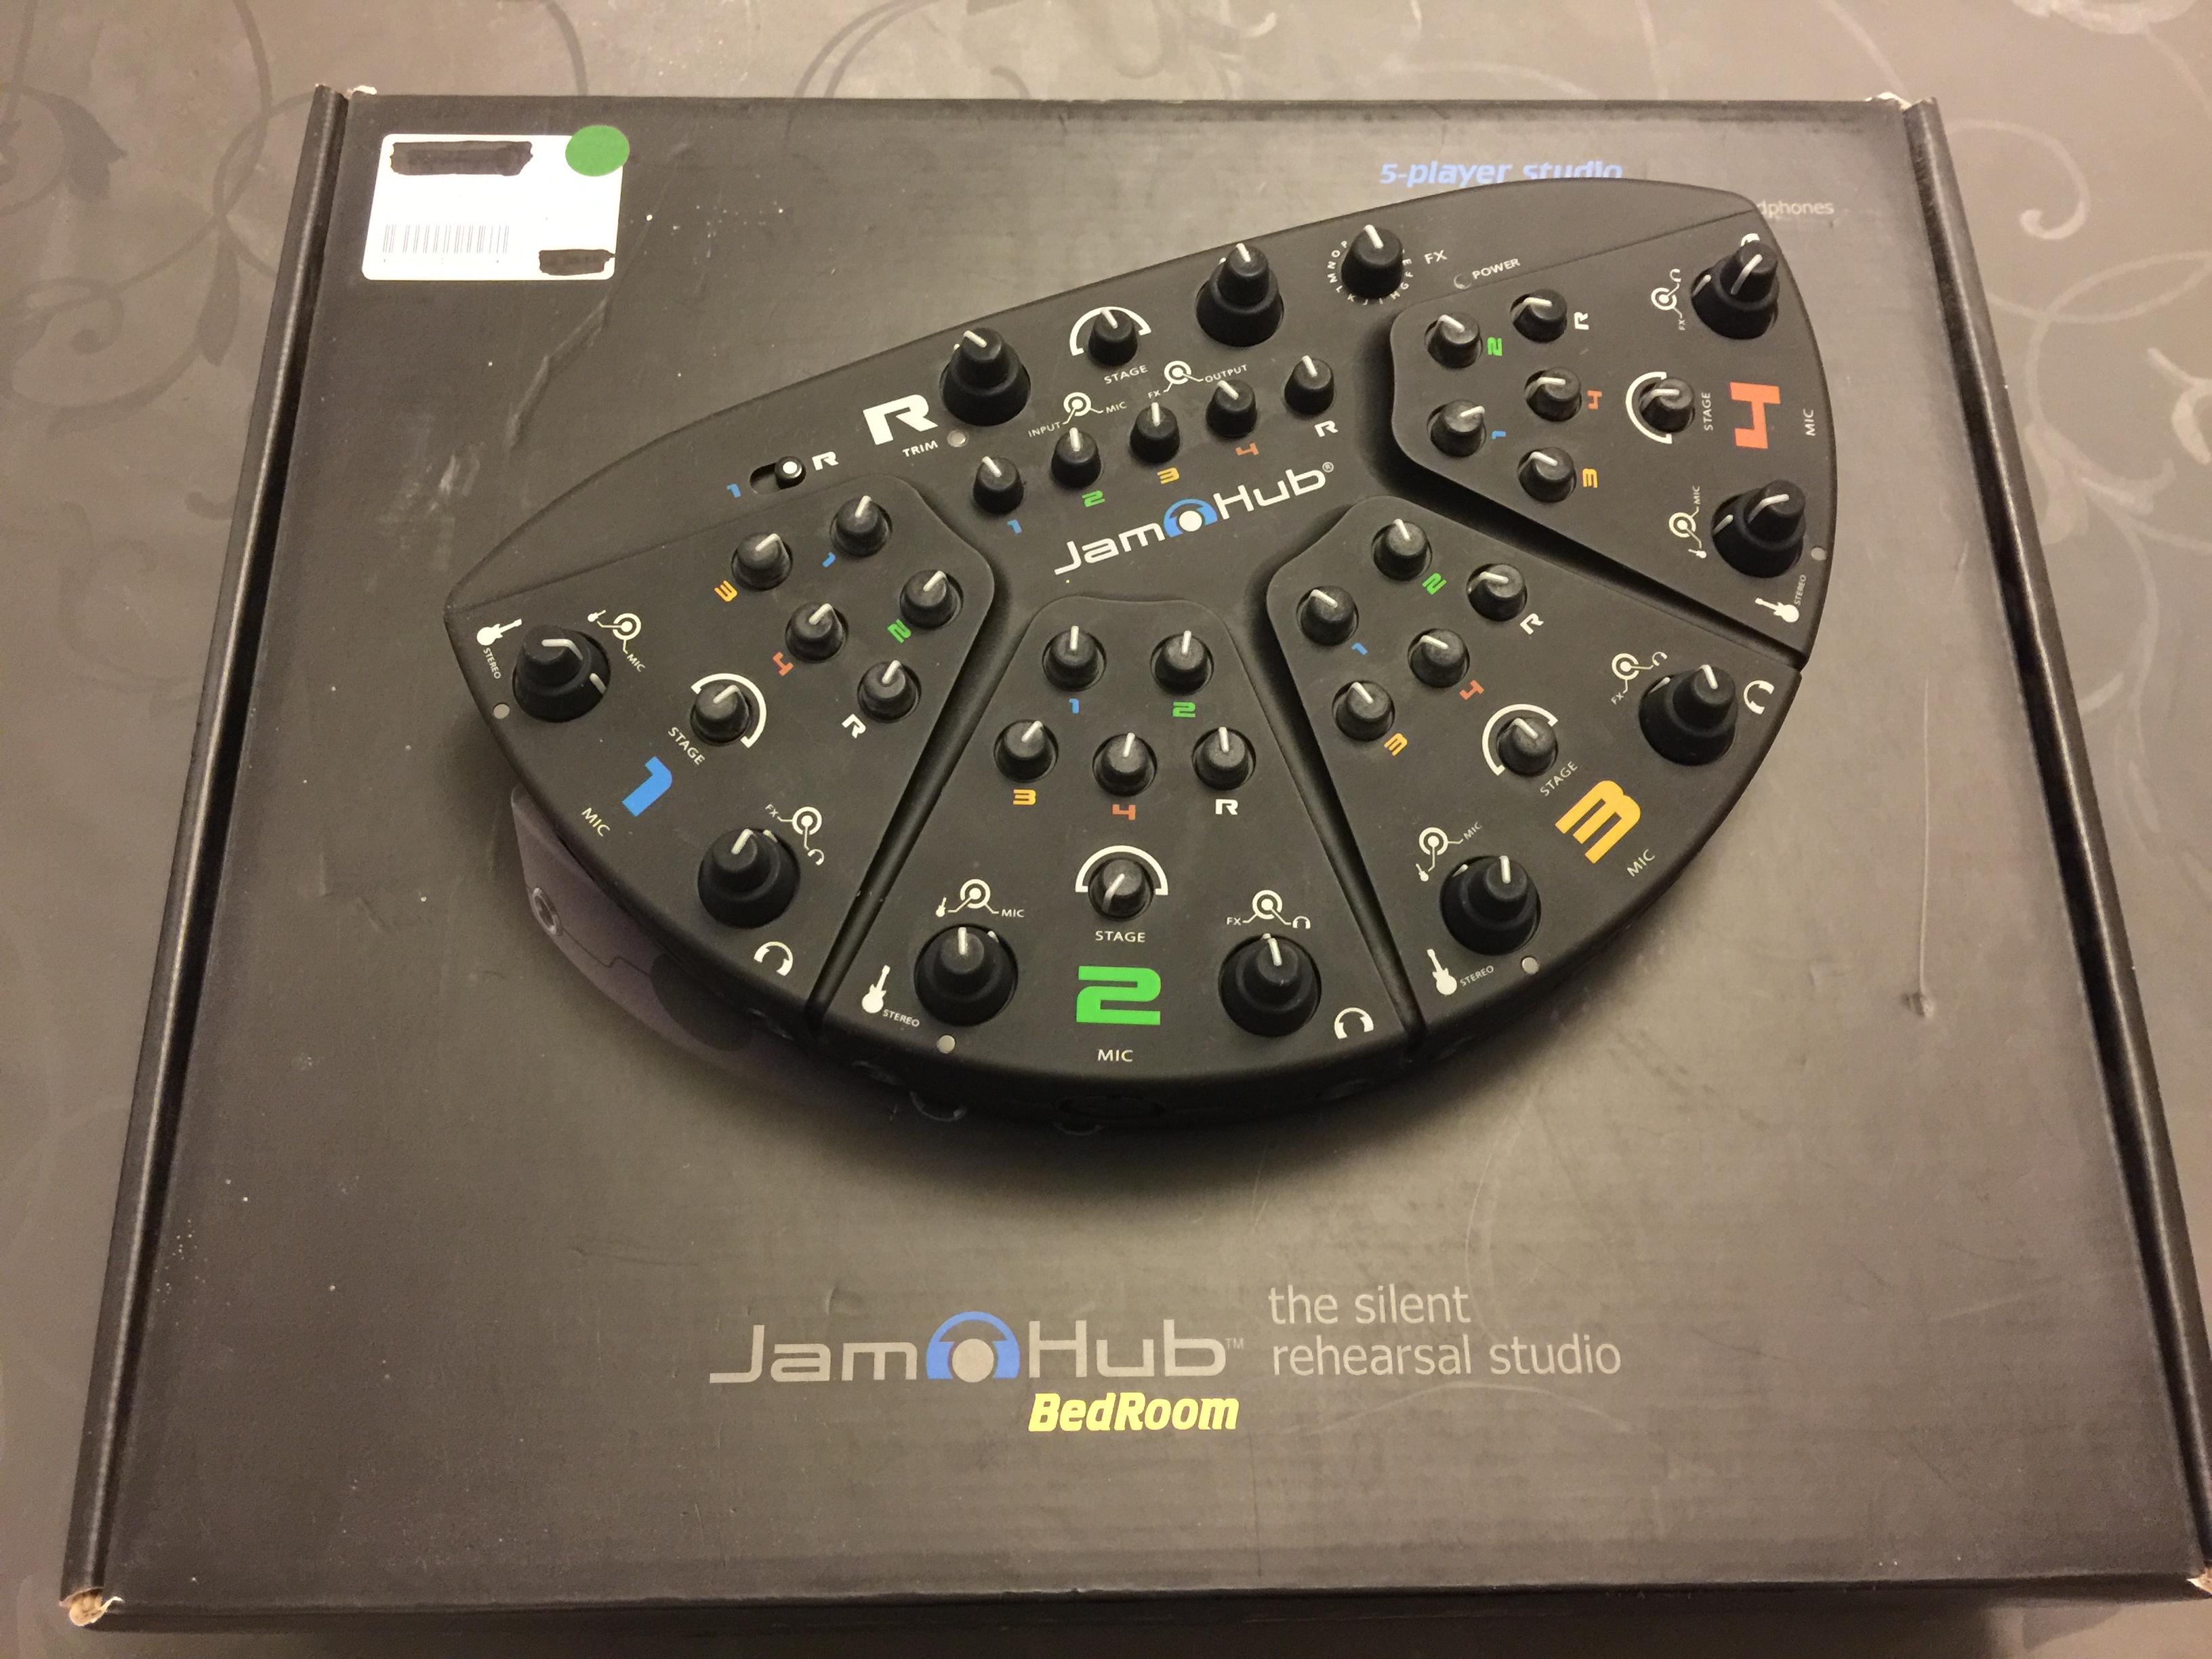 Images JamHub Bedroom. BEDROOM   JamHub Bedroom   Audiofanzine